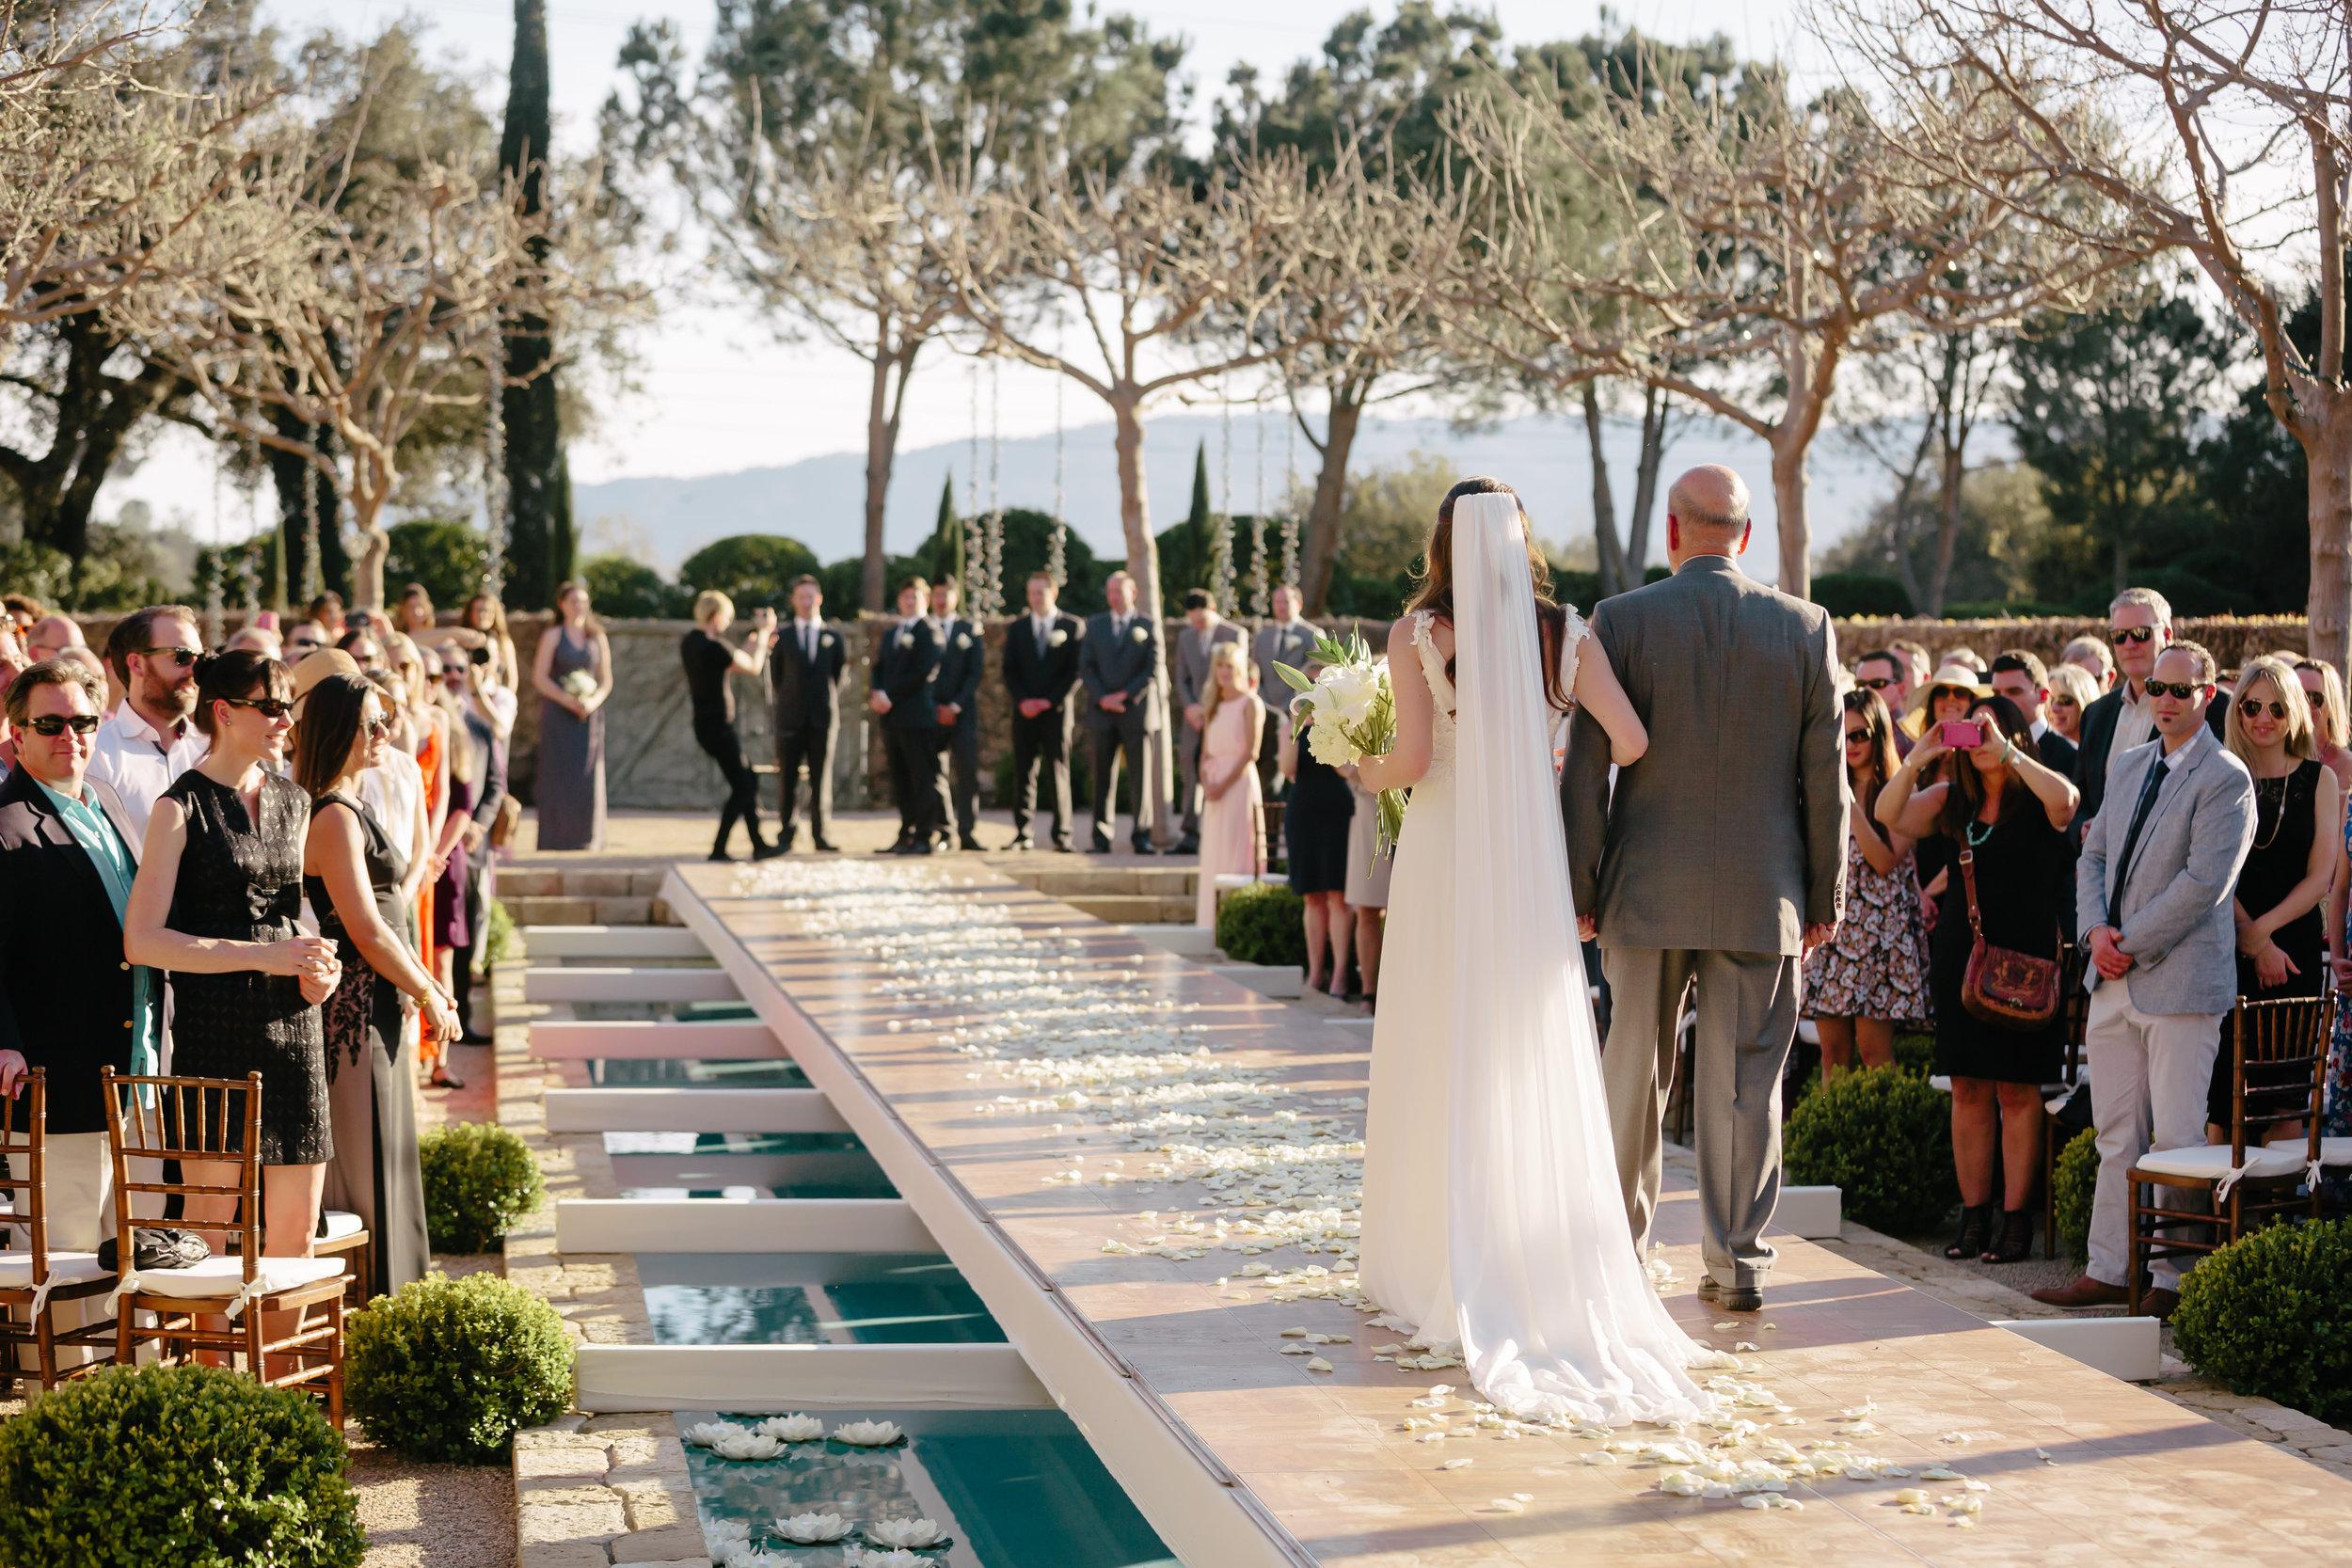 www.santabarbarawedding.com | Rewind Photography | Provence in Ojai | Father and Bride | Ceremony